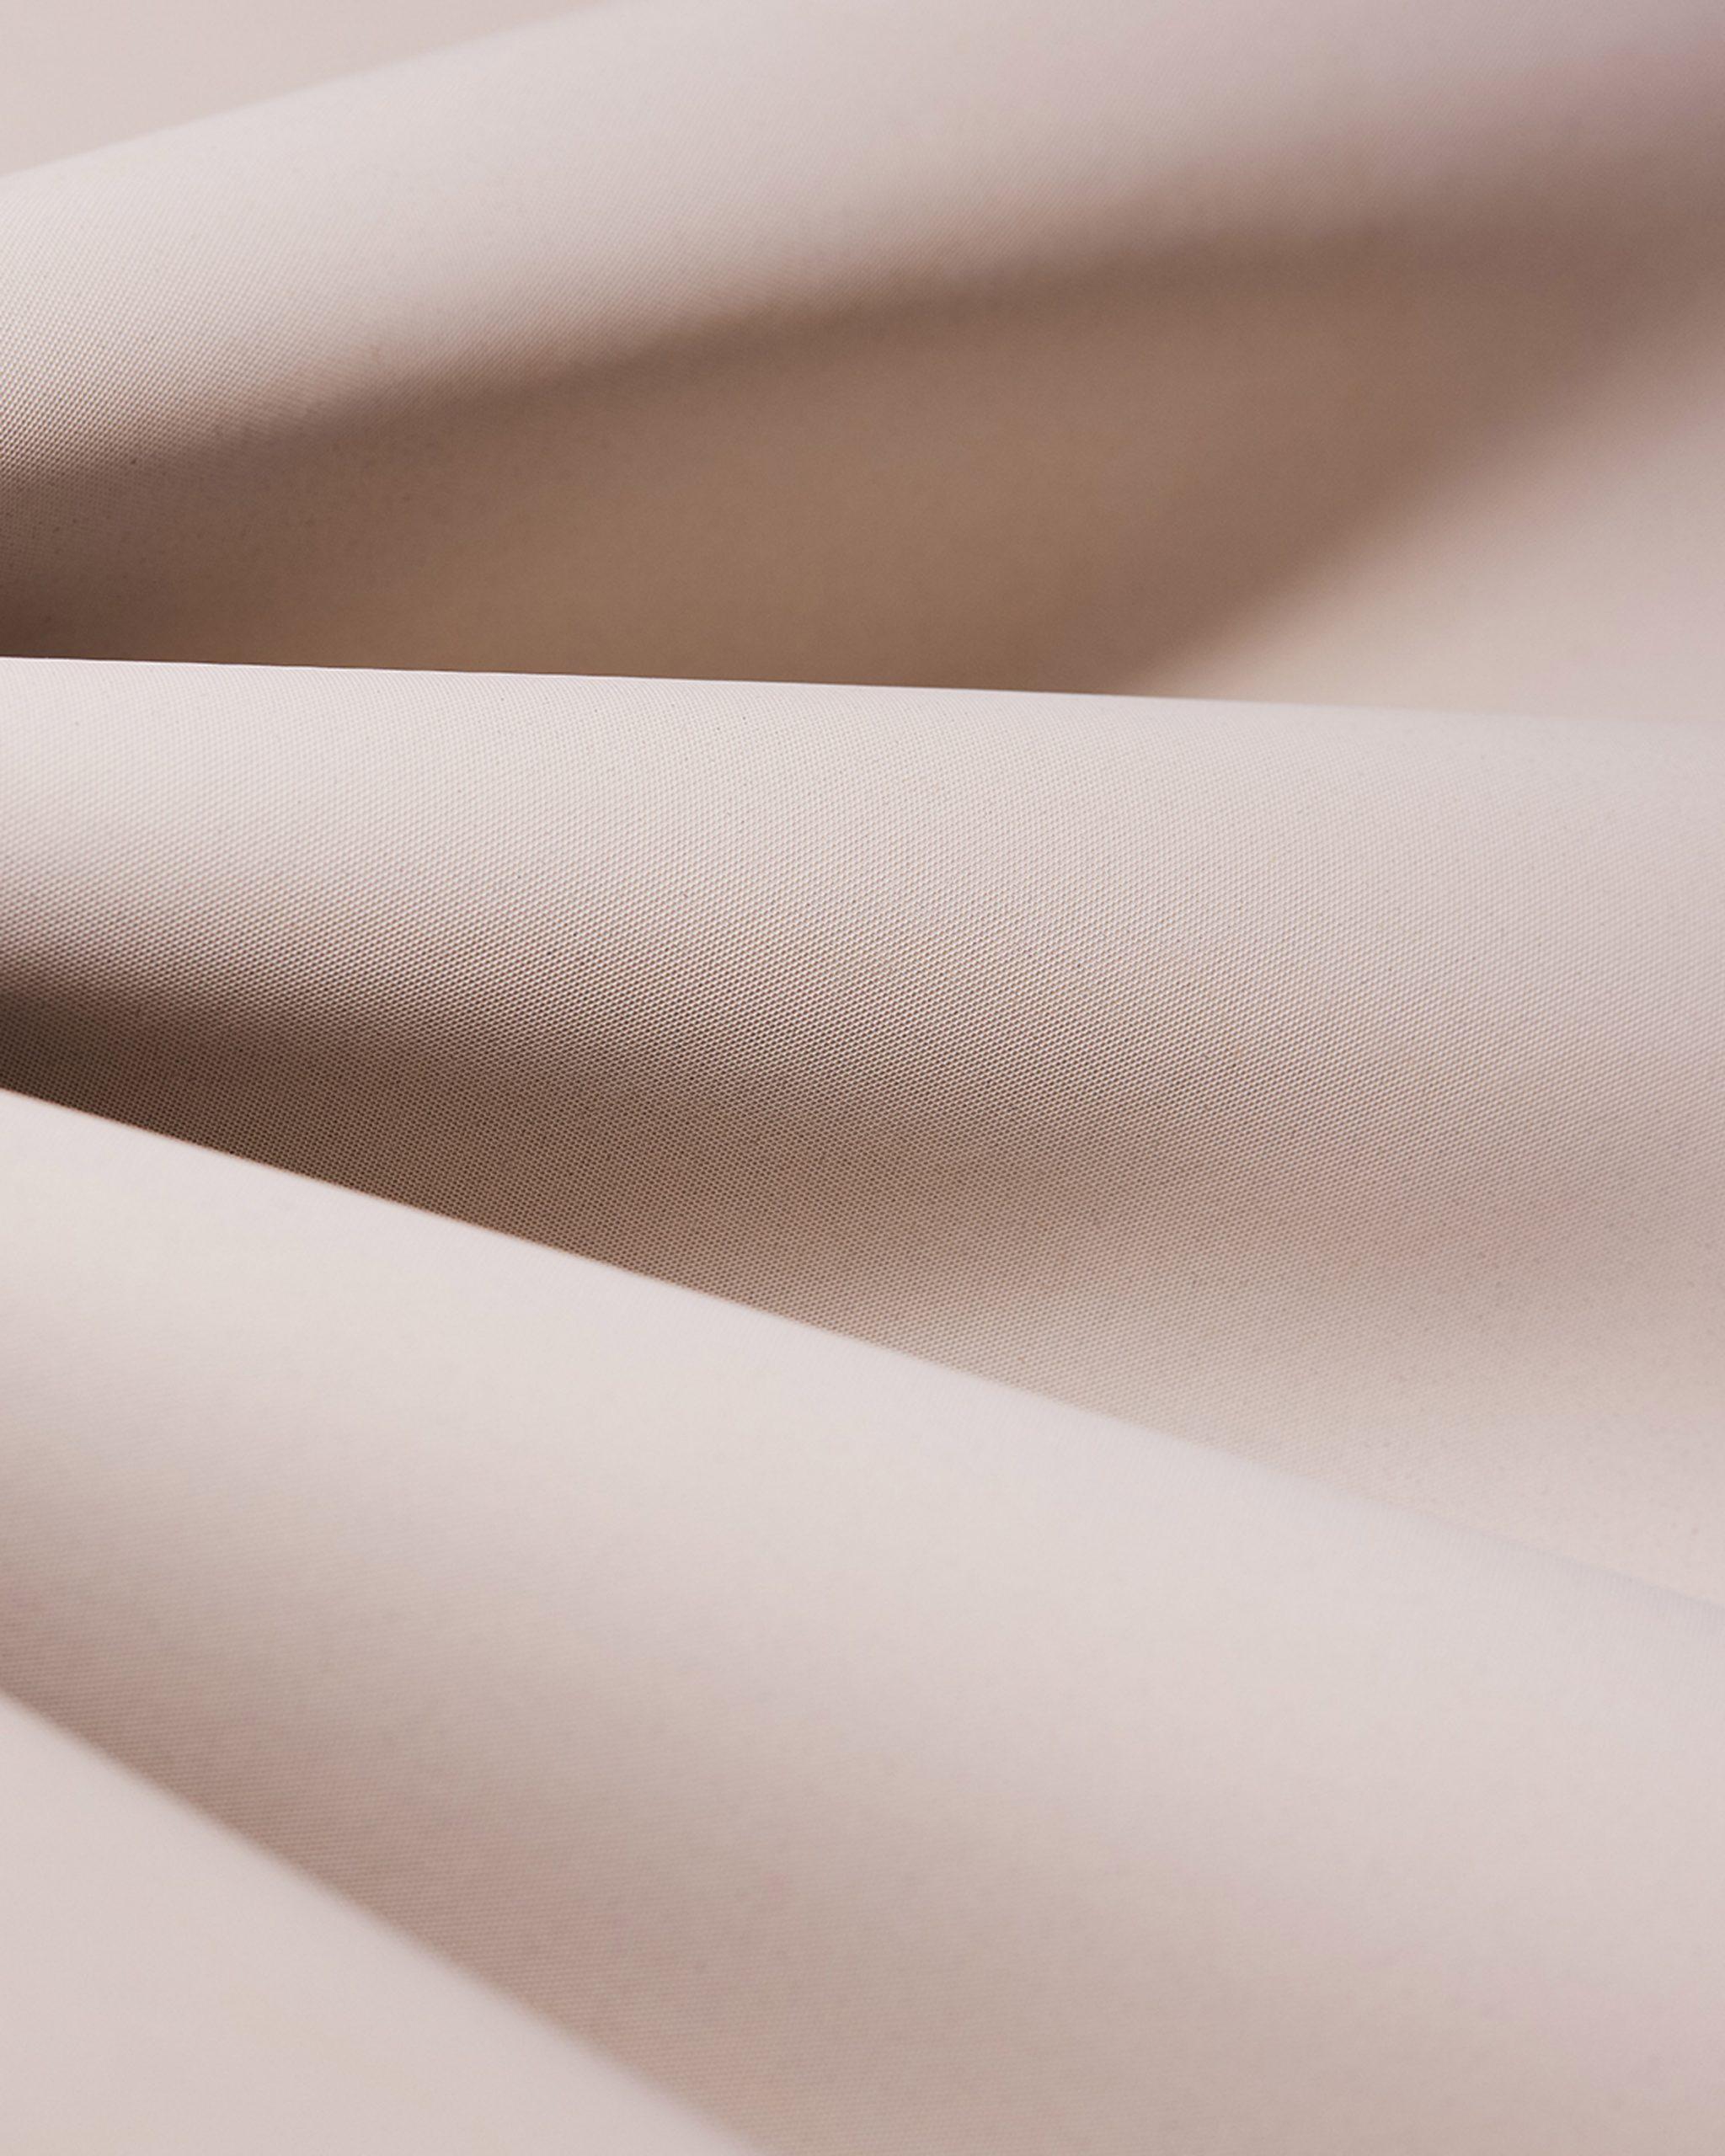 Close-up swatch of material developed by Allbirds Natural Fiber Welding